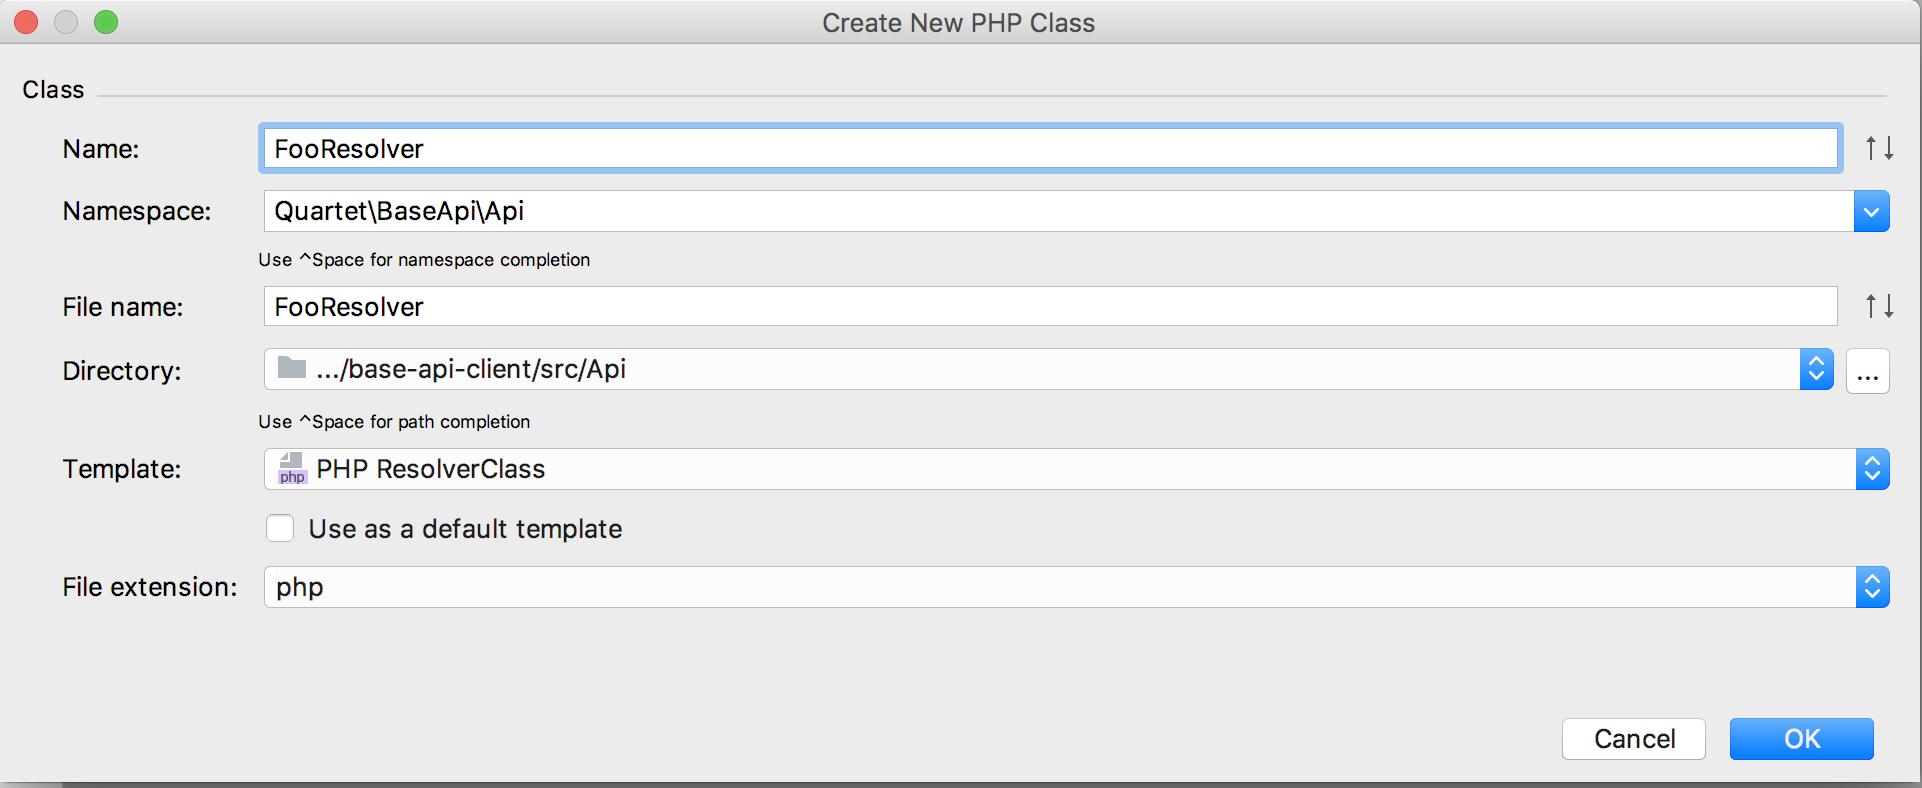 CreateNewPHPClassでnameにFooResolver TemplateにPHP ResolverClassを選んだところ